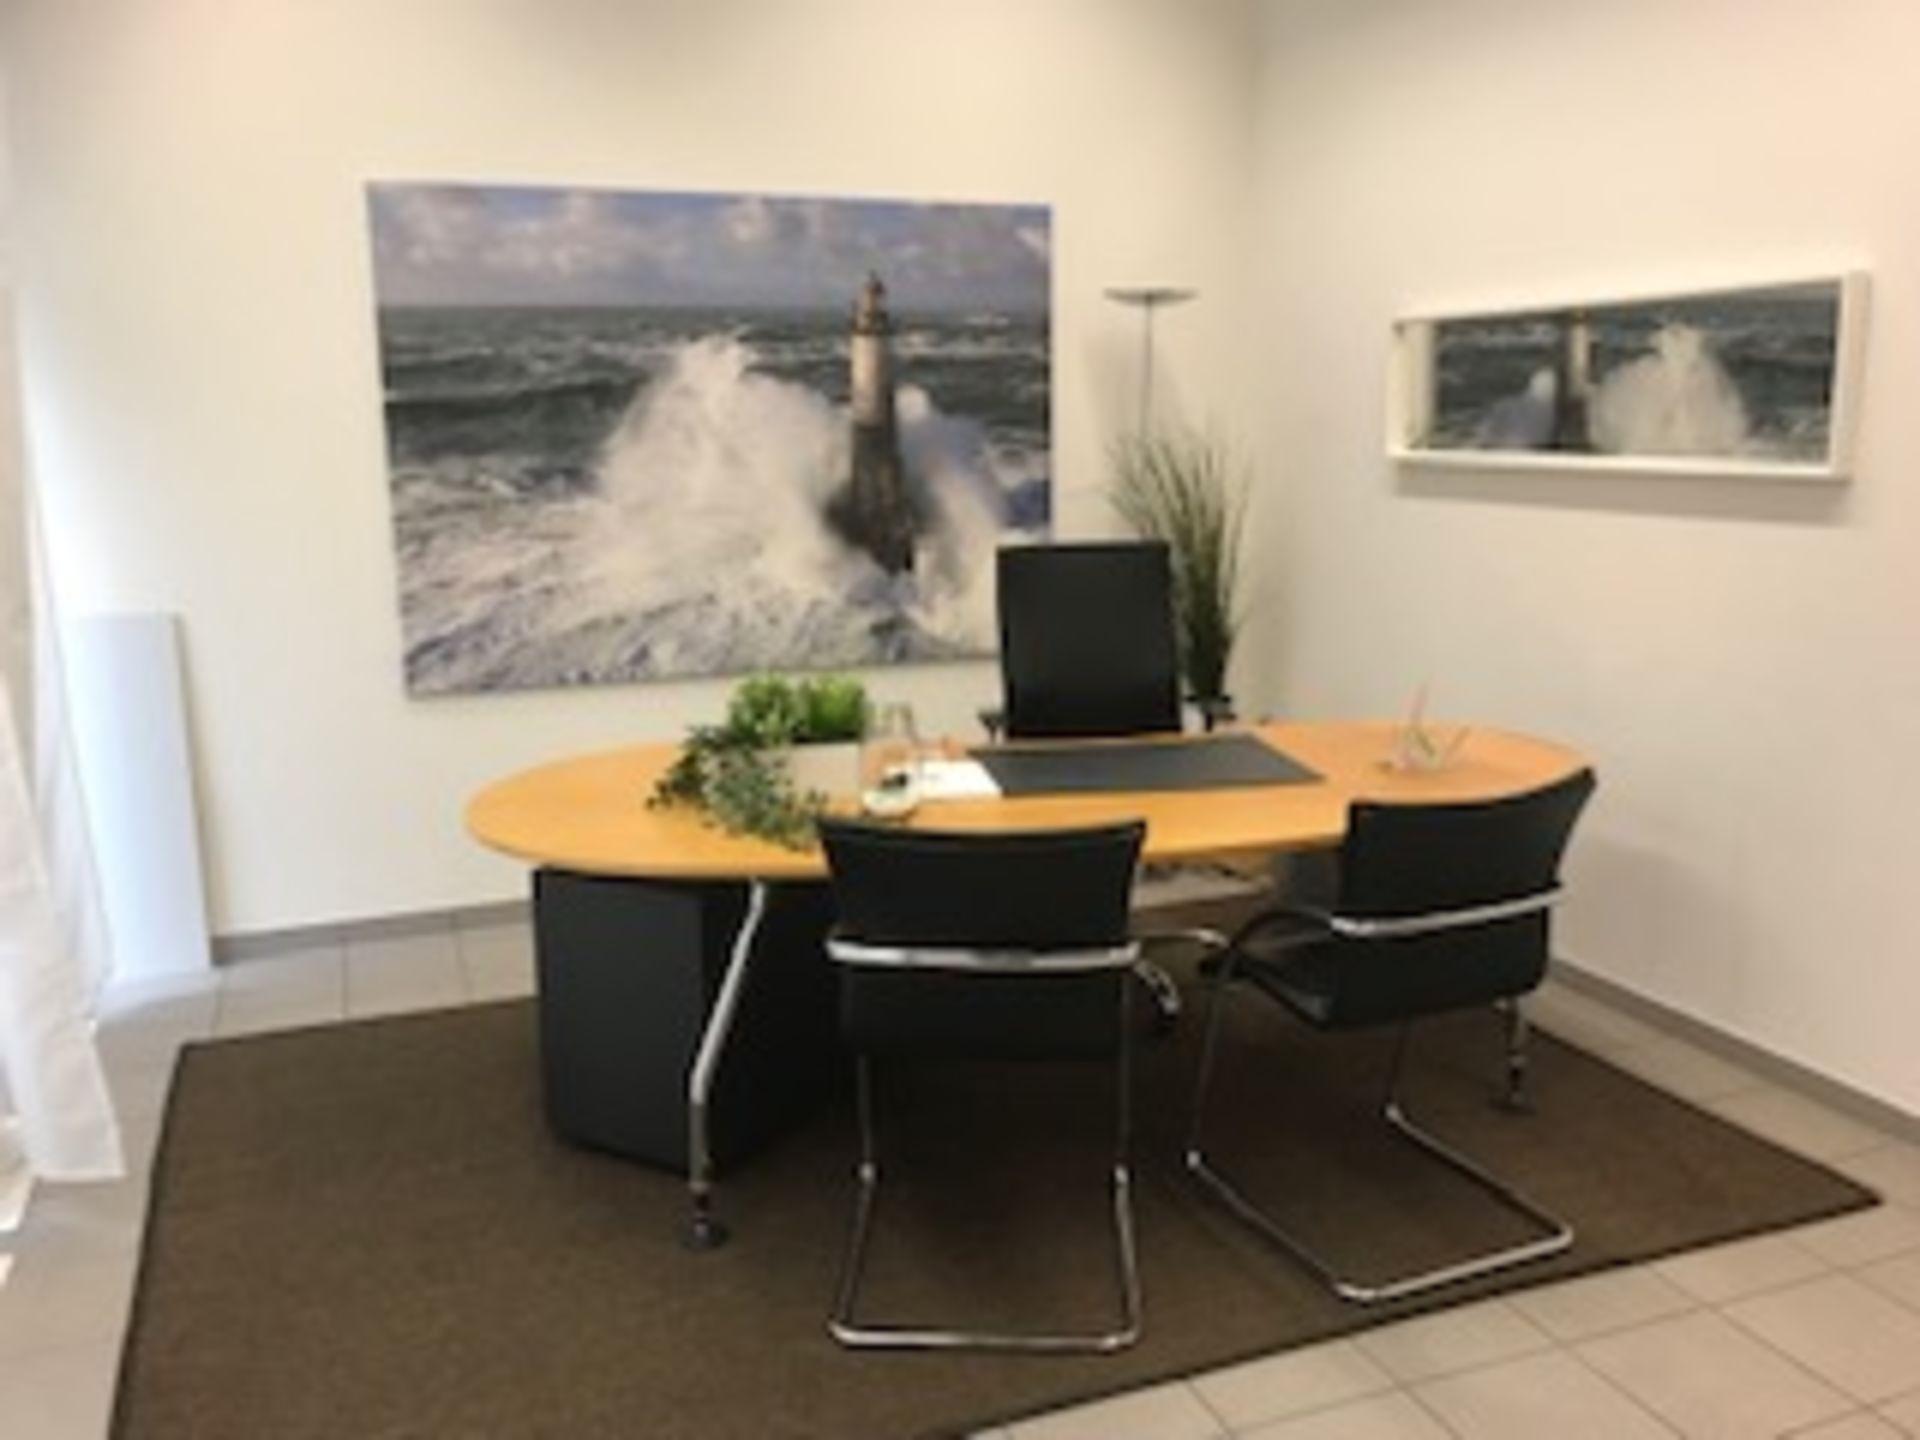 Miete: Büro, Praxis vis à vis Bahnhof